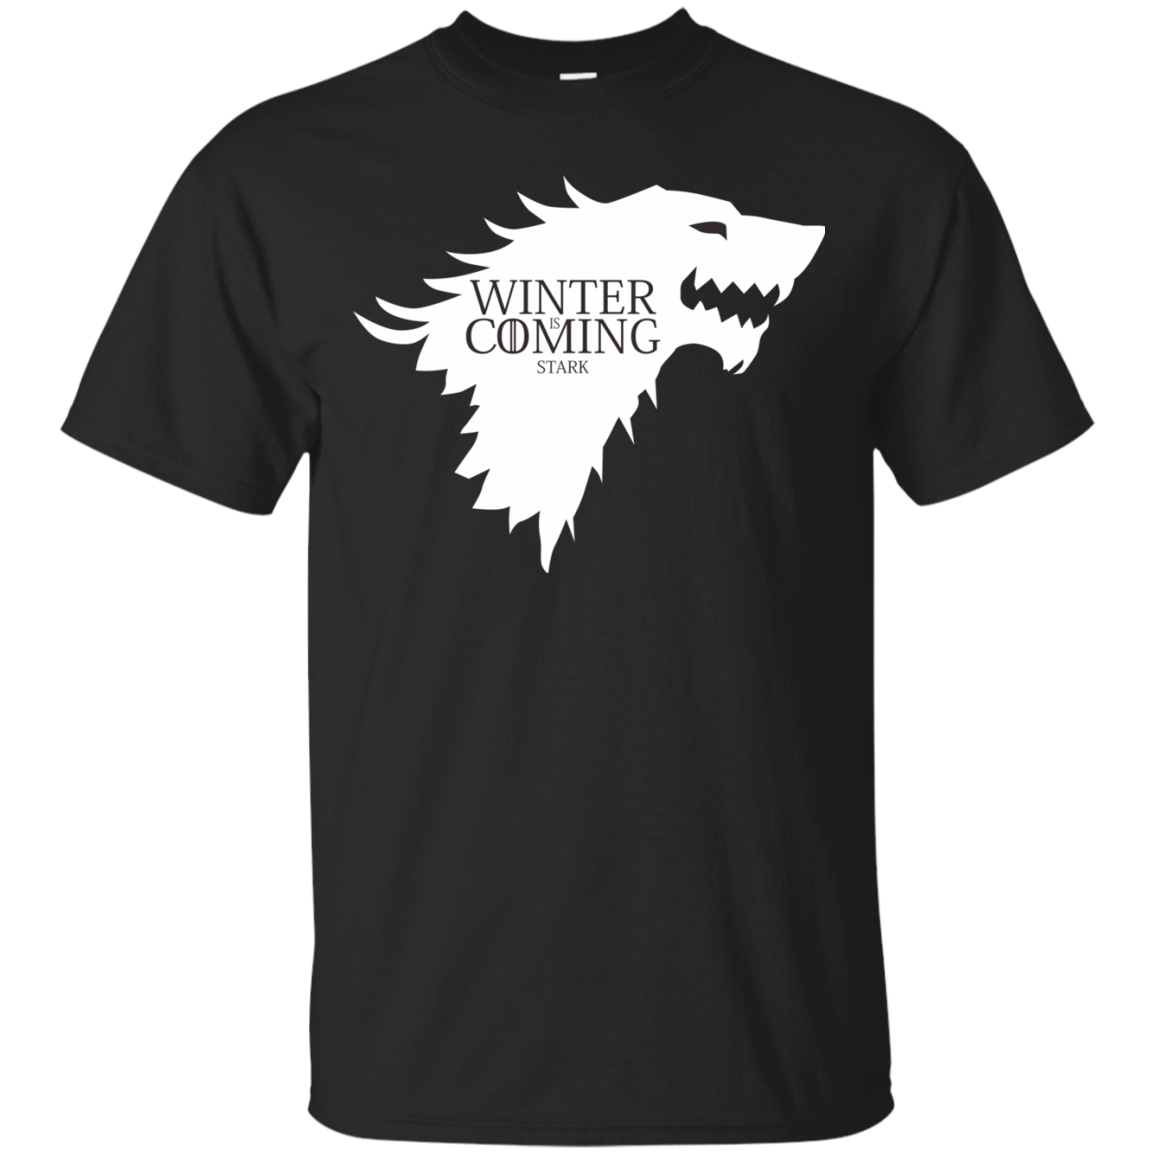 Winter Is Coming Game Of Thrones Stark Lannister T Shirt Awesome Teeshirts Winter Is Coming Game Of Thrones Shirts Shirts